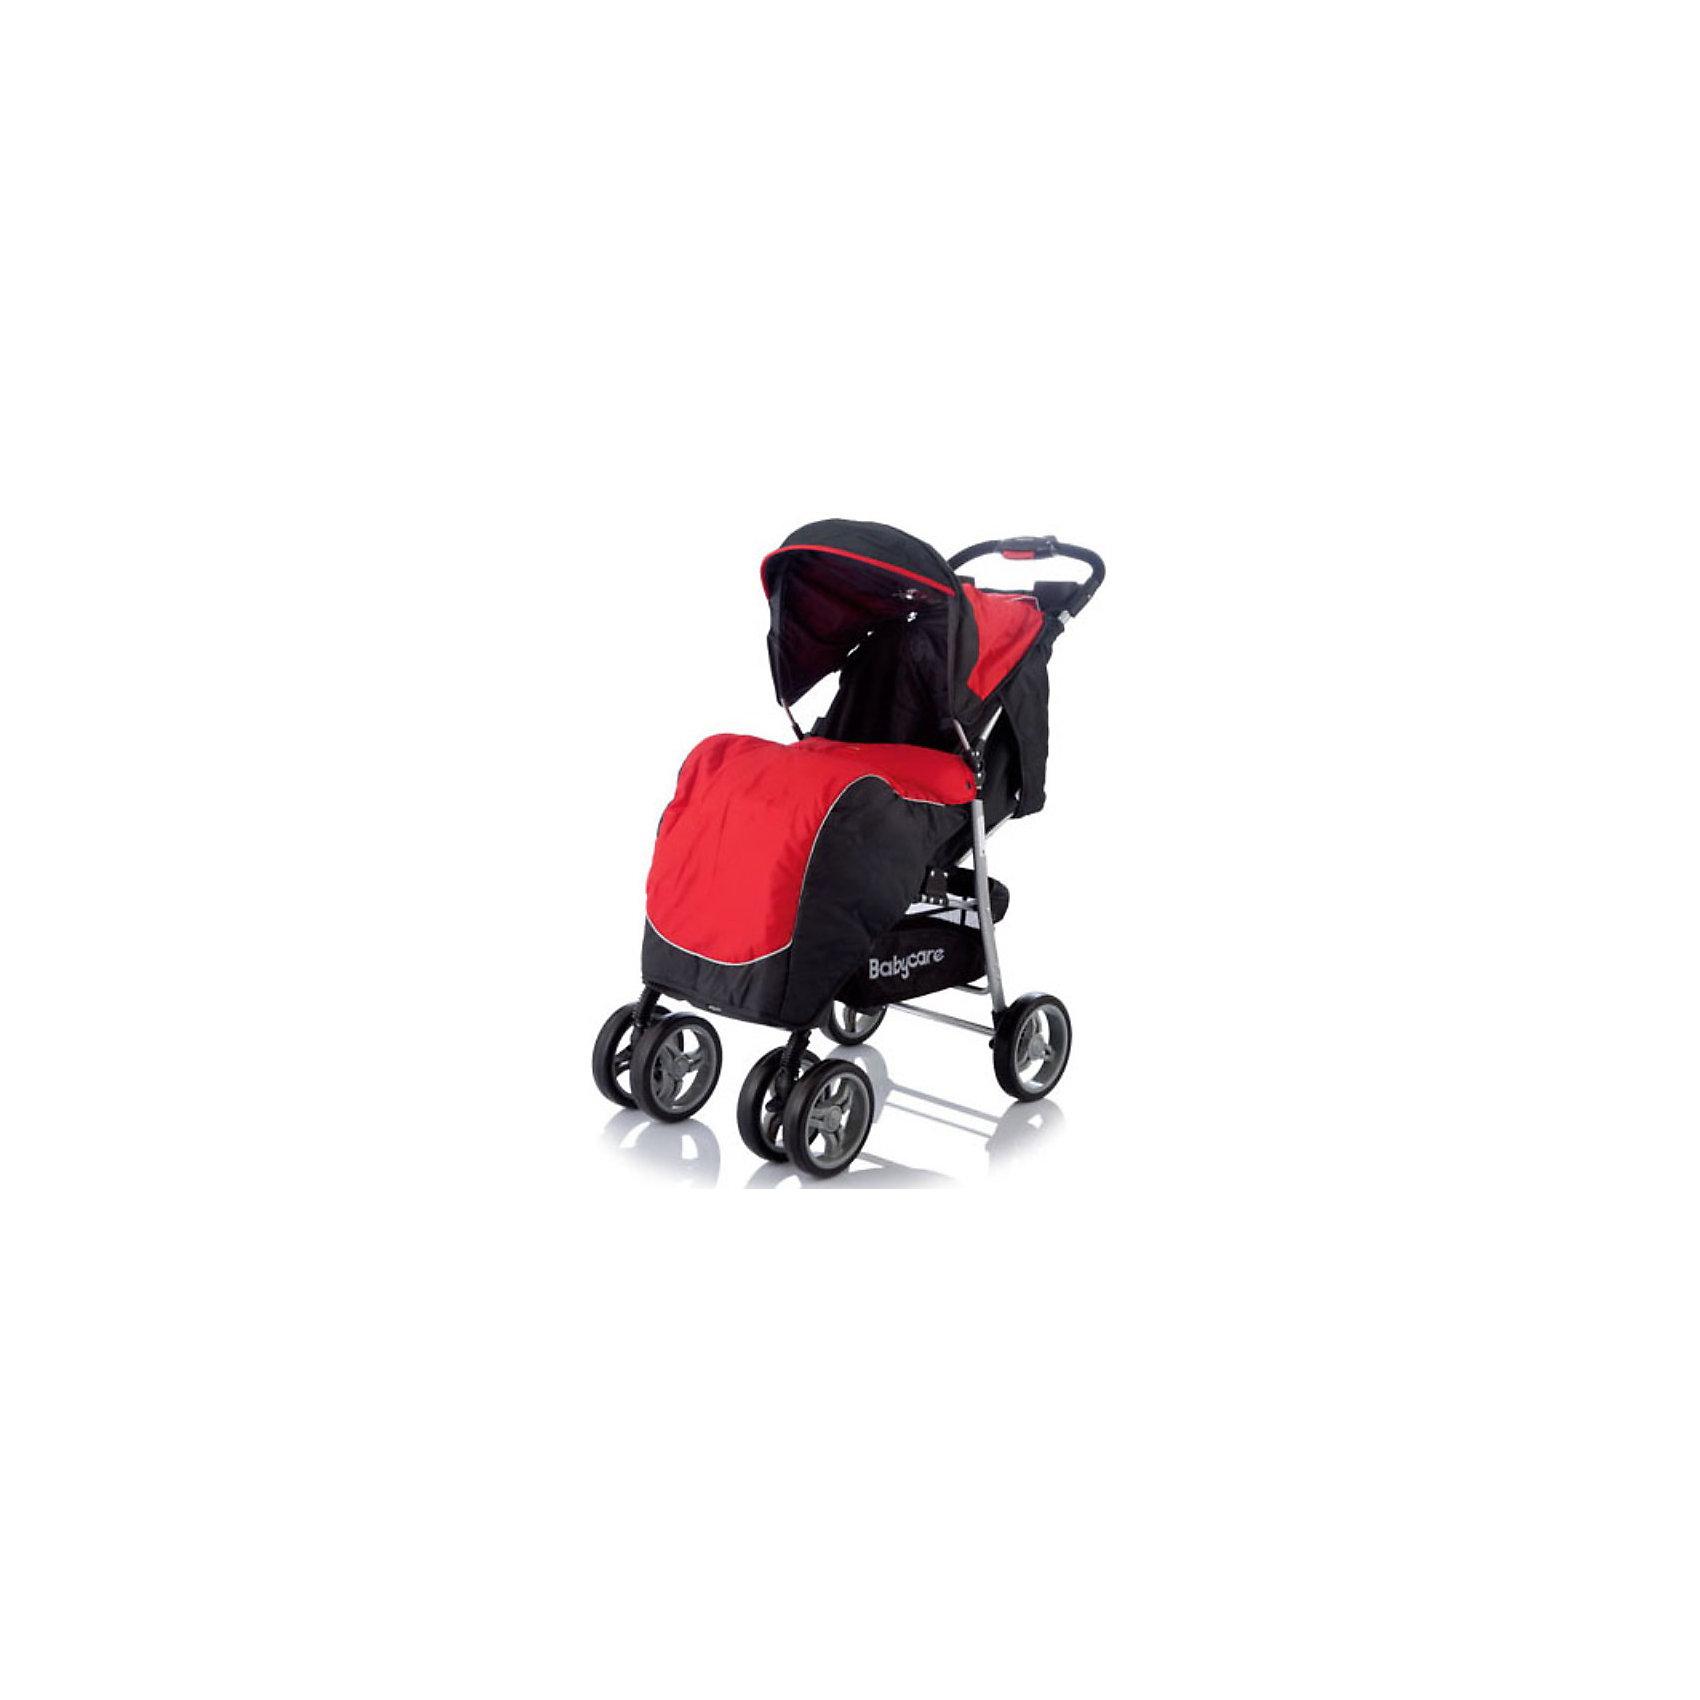 Прогулочная коляска Baby Care Voyager, красный